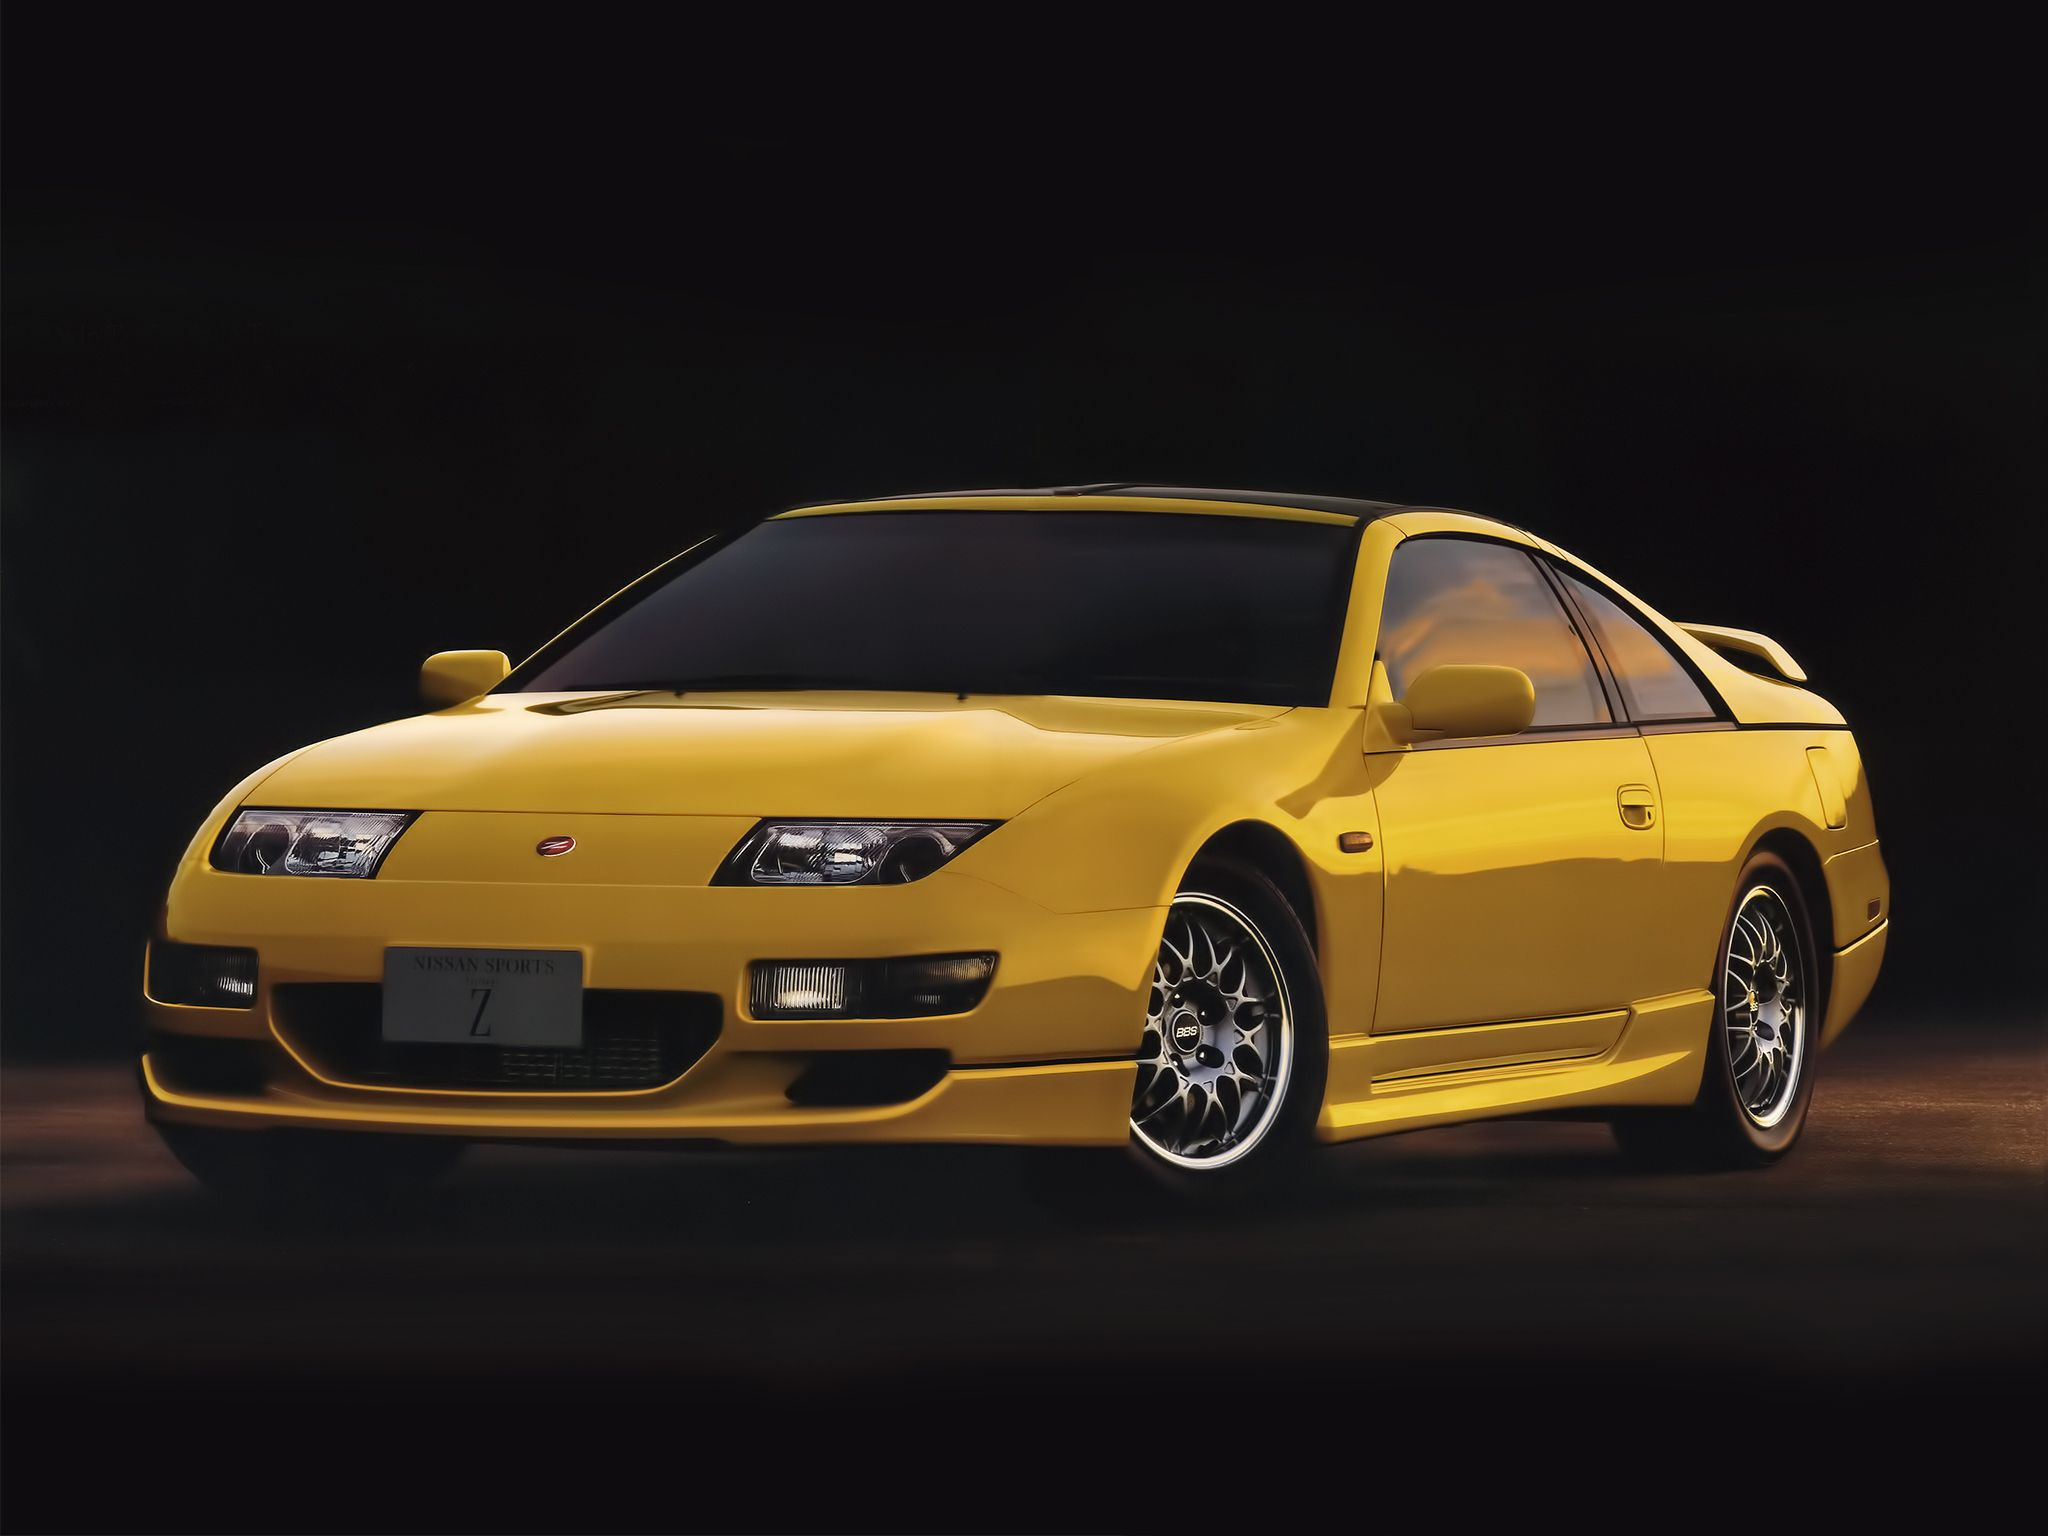 19982000 Nissan Fairlady Z Version R Twin Turbo 2by2